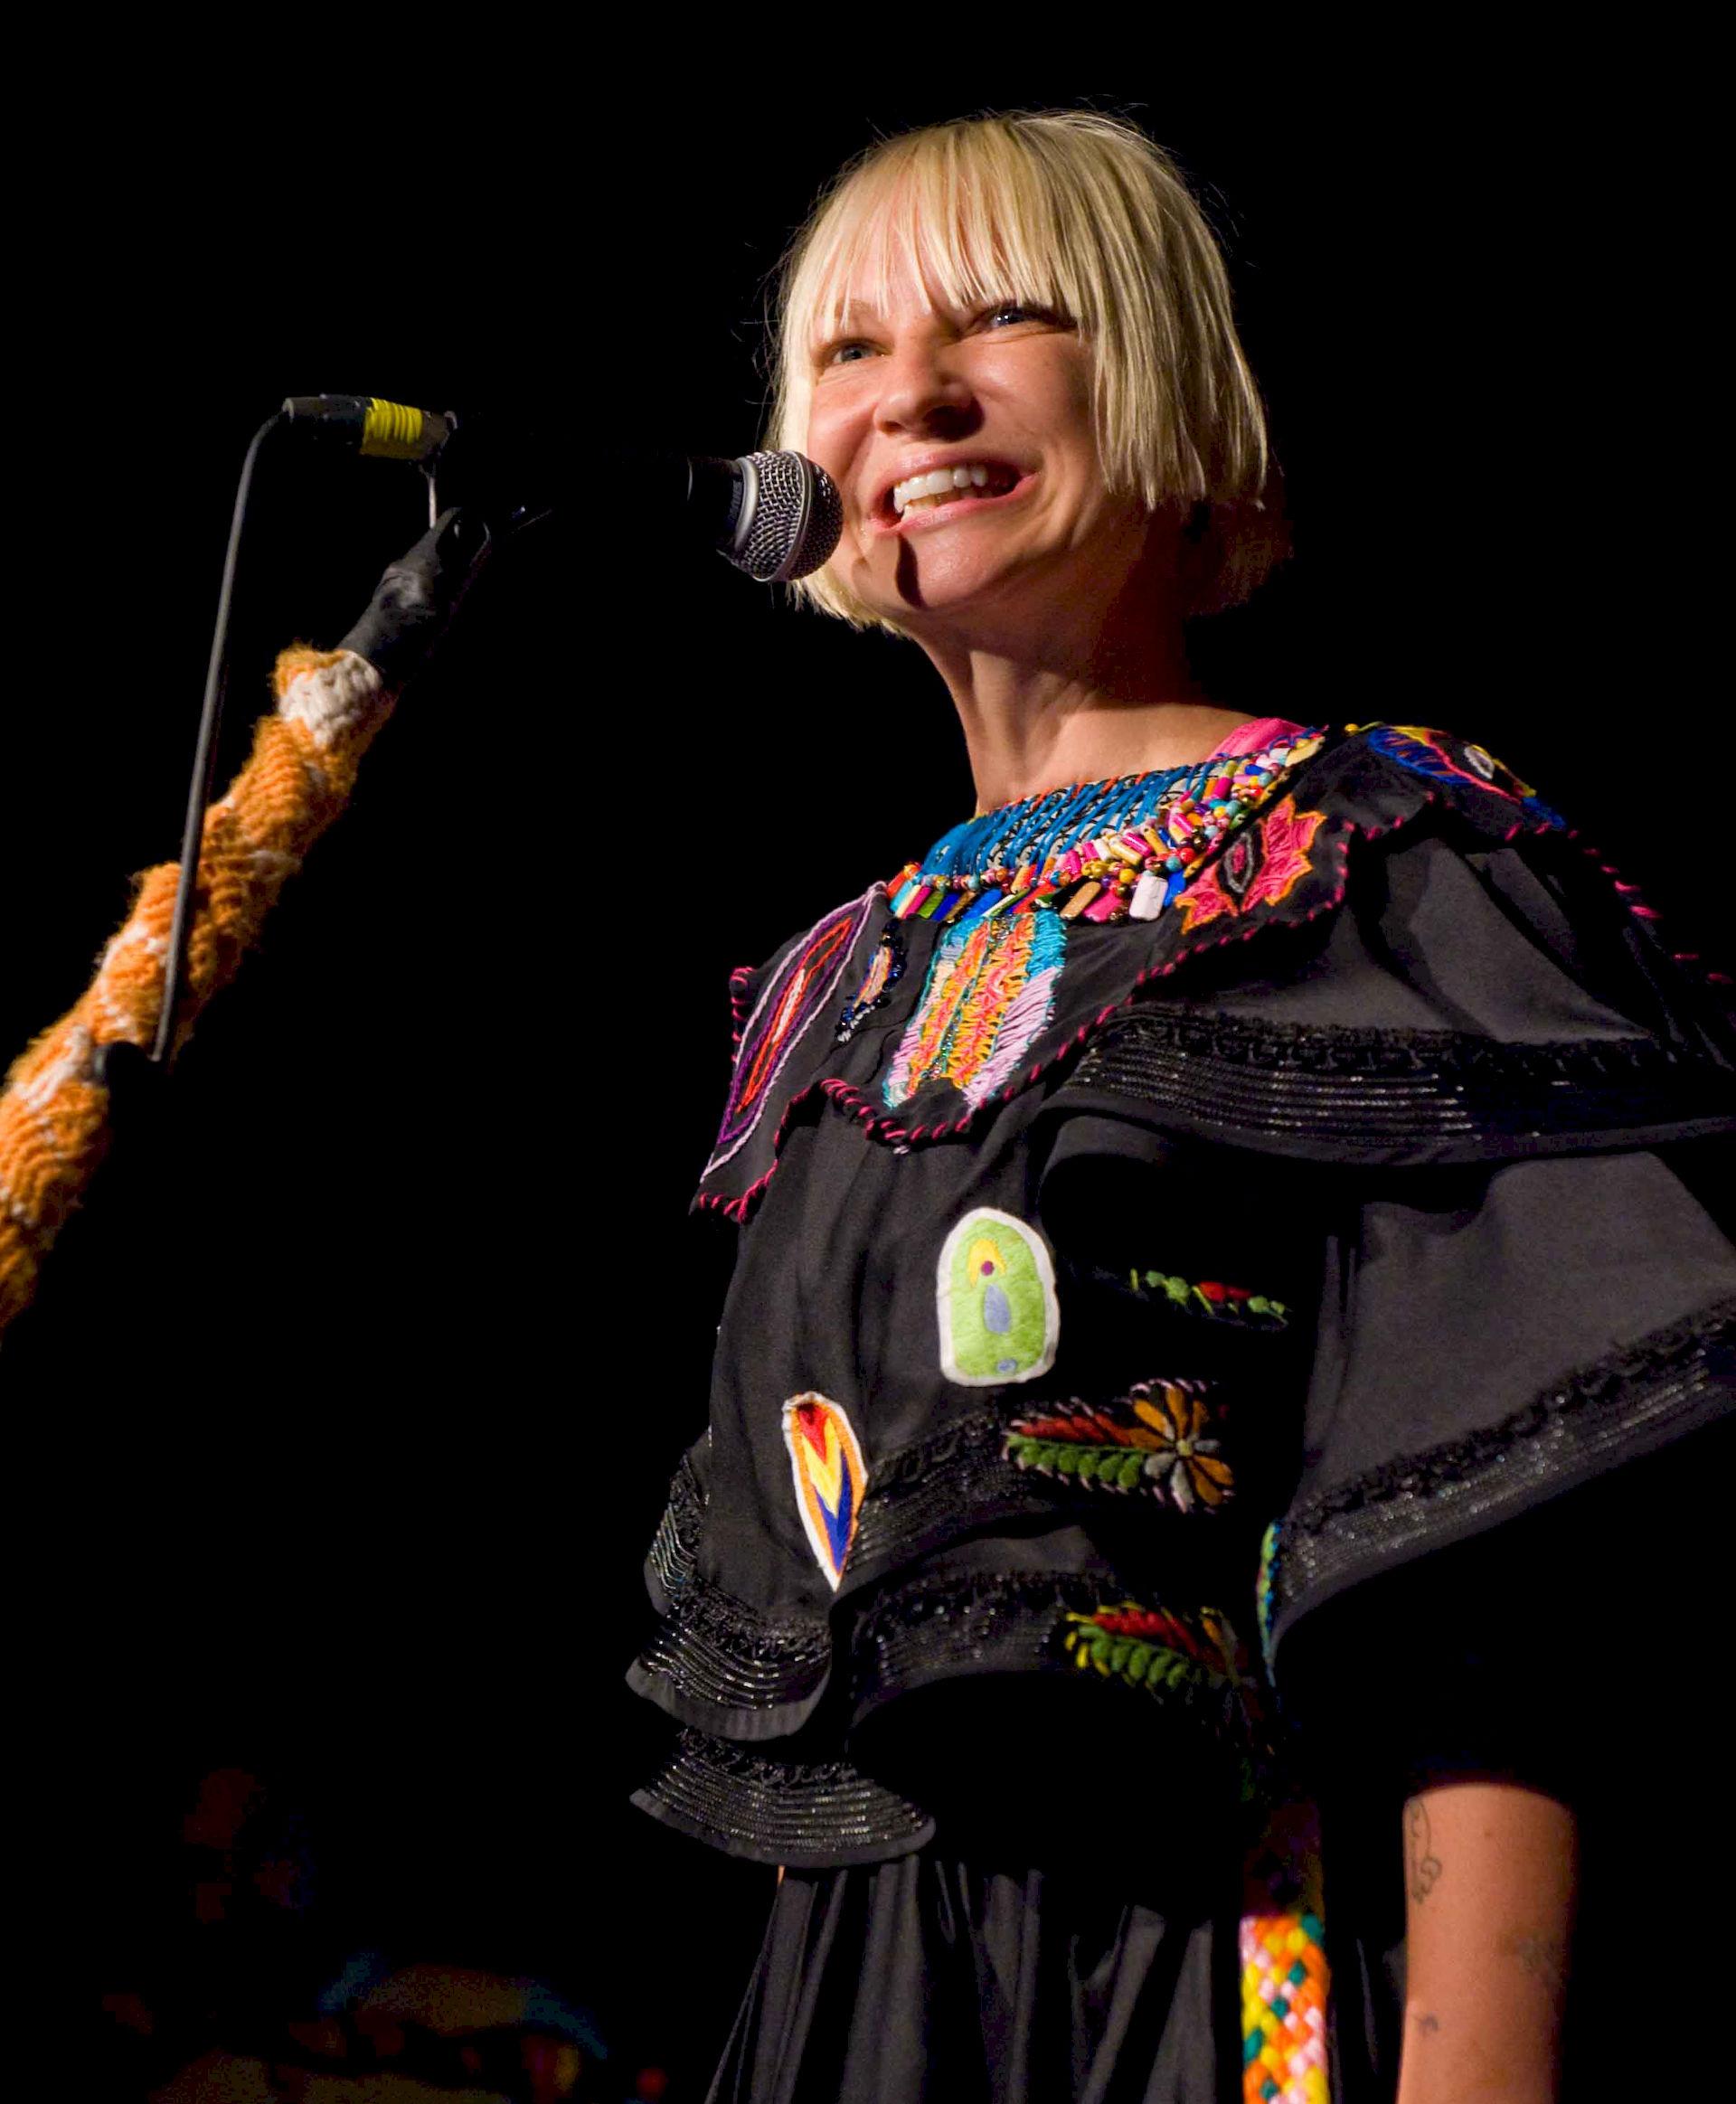 Photo of Sia Furler: Singer